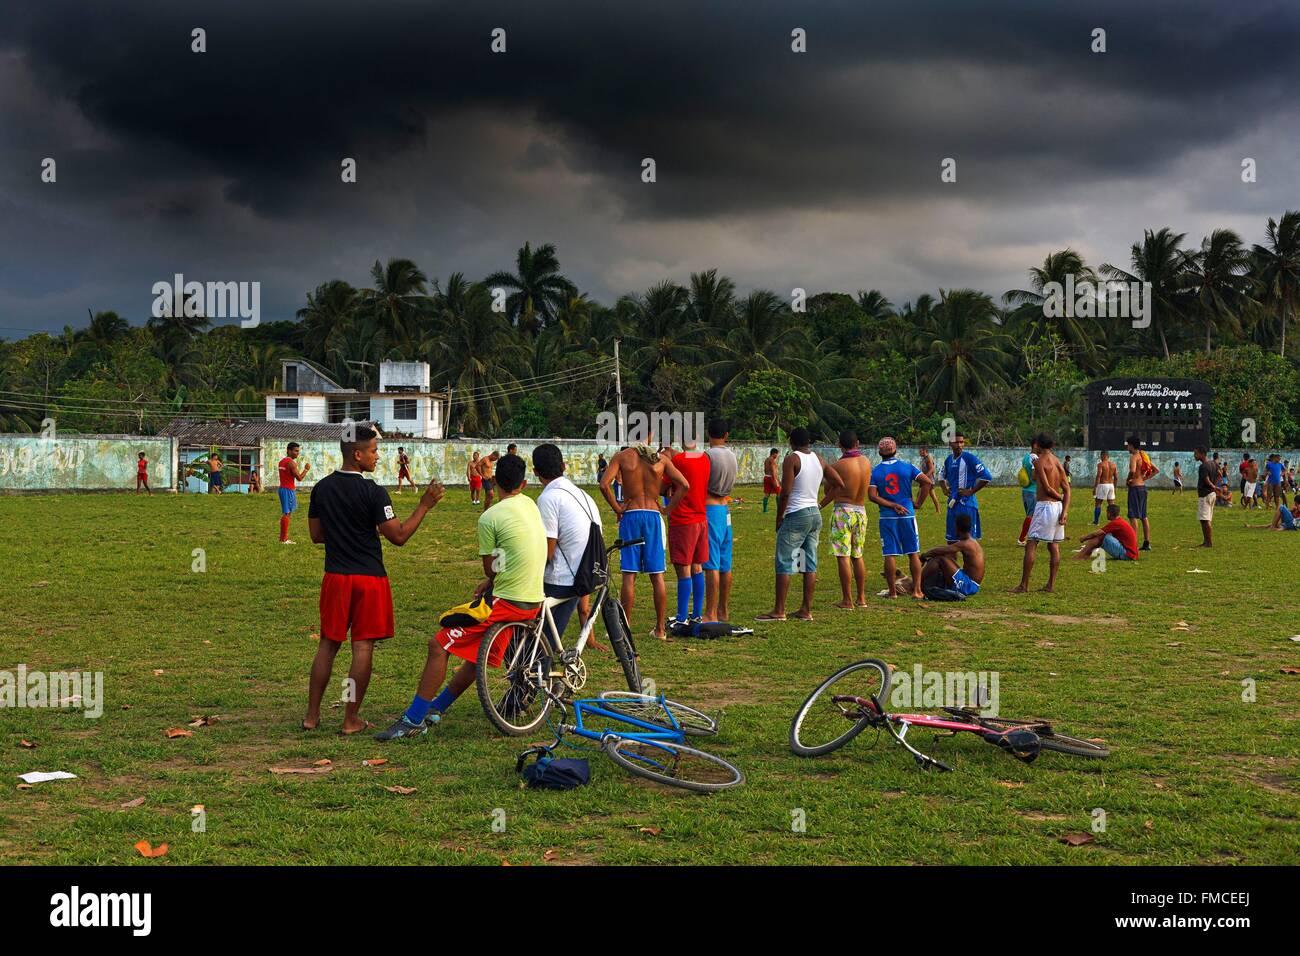 Cuba, Guantanamo, Baracoa, Football players on field under threatening skies - Stock Image